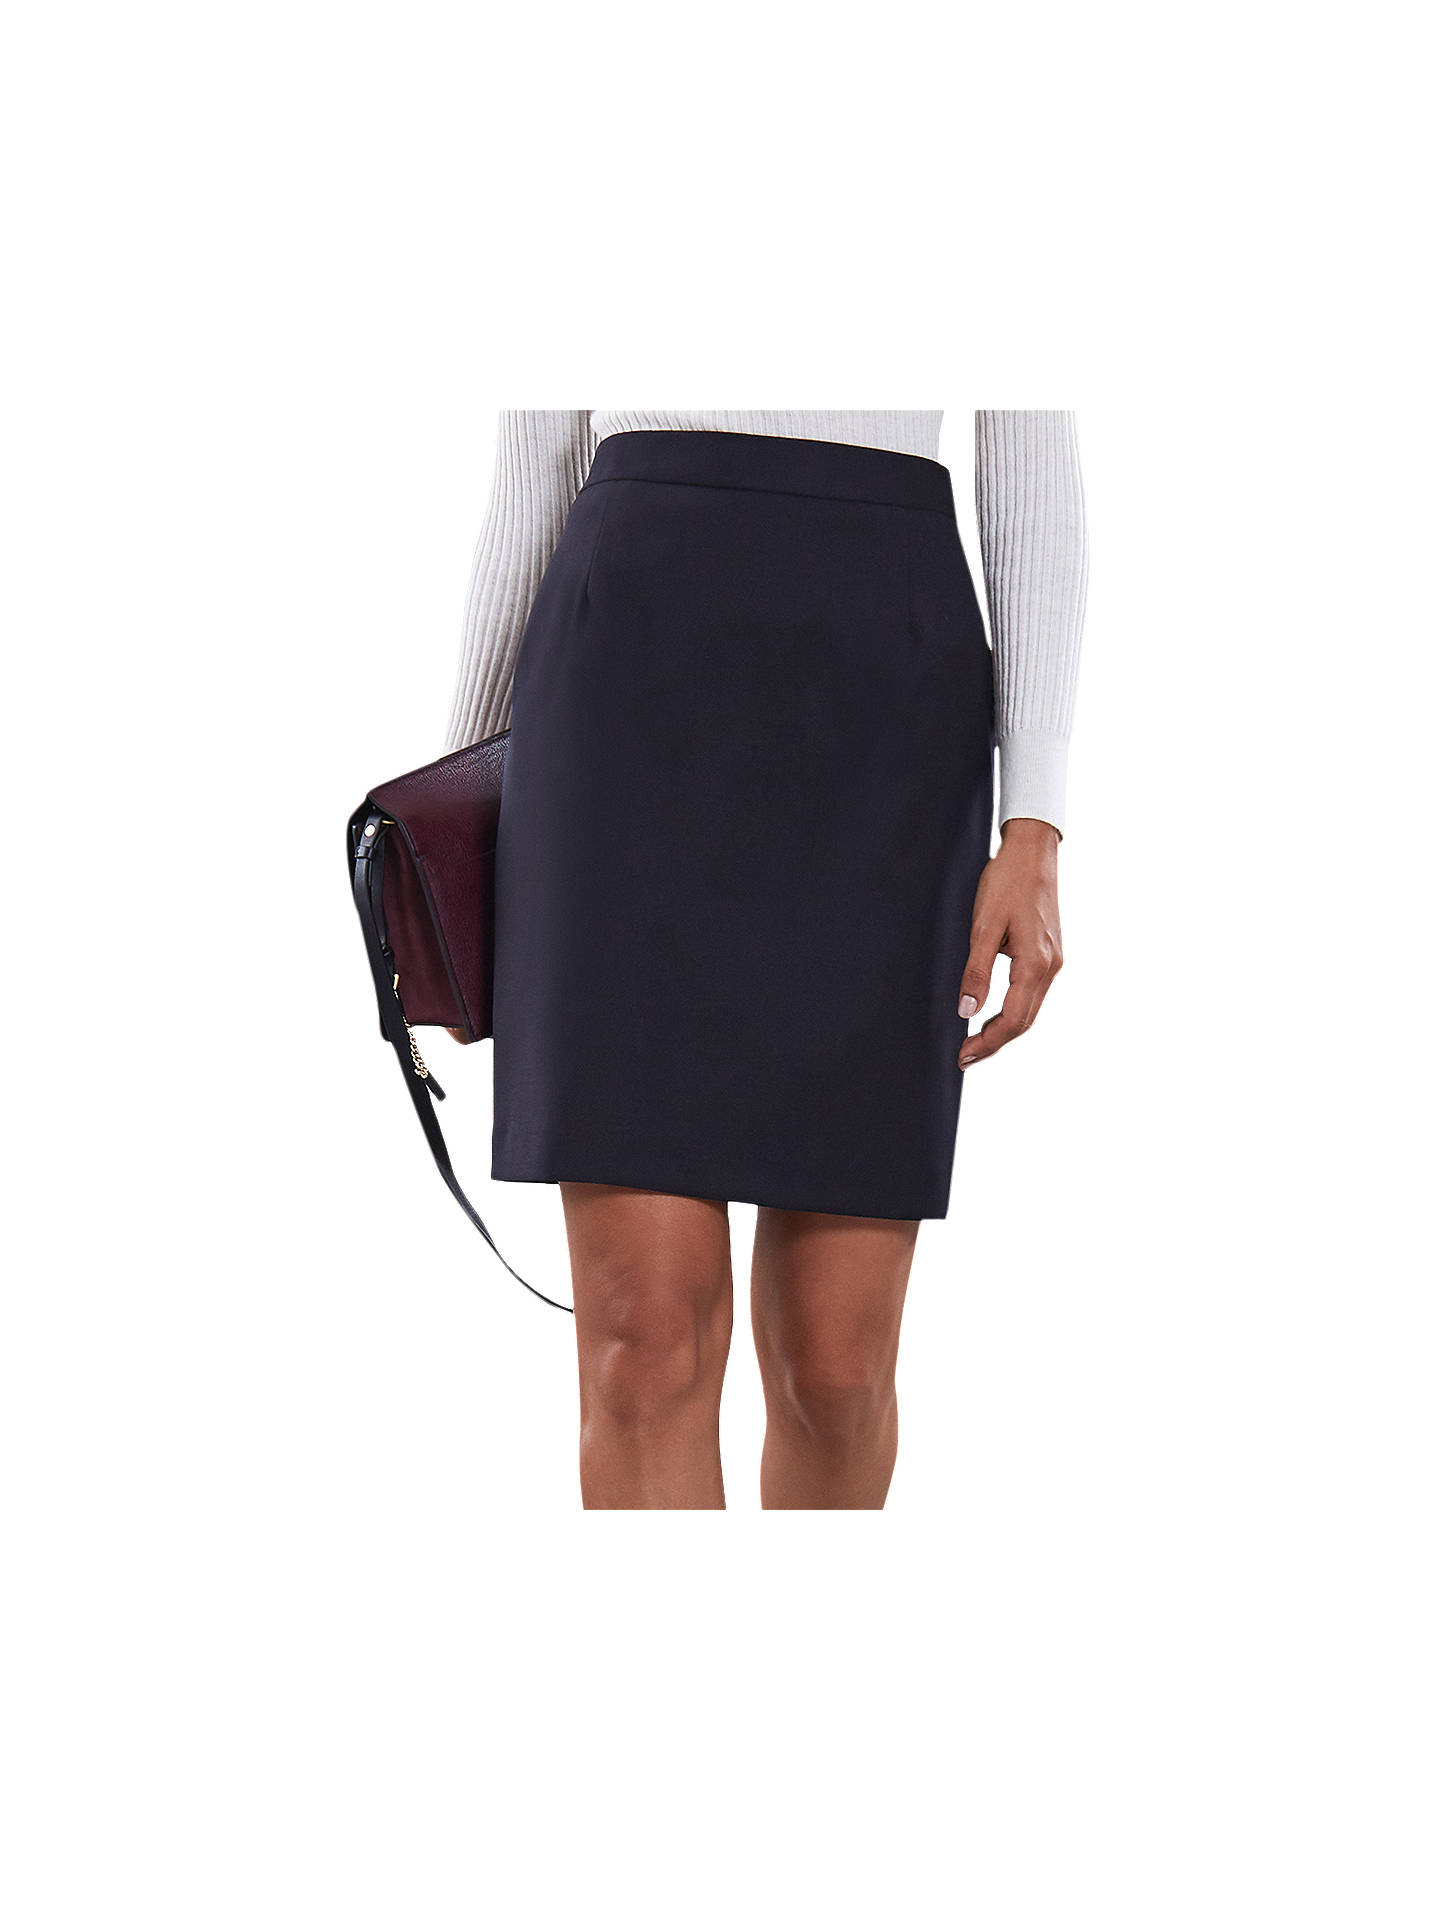 8ef0bbc419 Buy Reiss Fenton Pencil Skirt, Navy, 12 Online at johnlewis.com ...